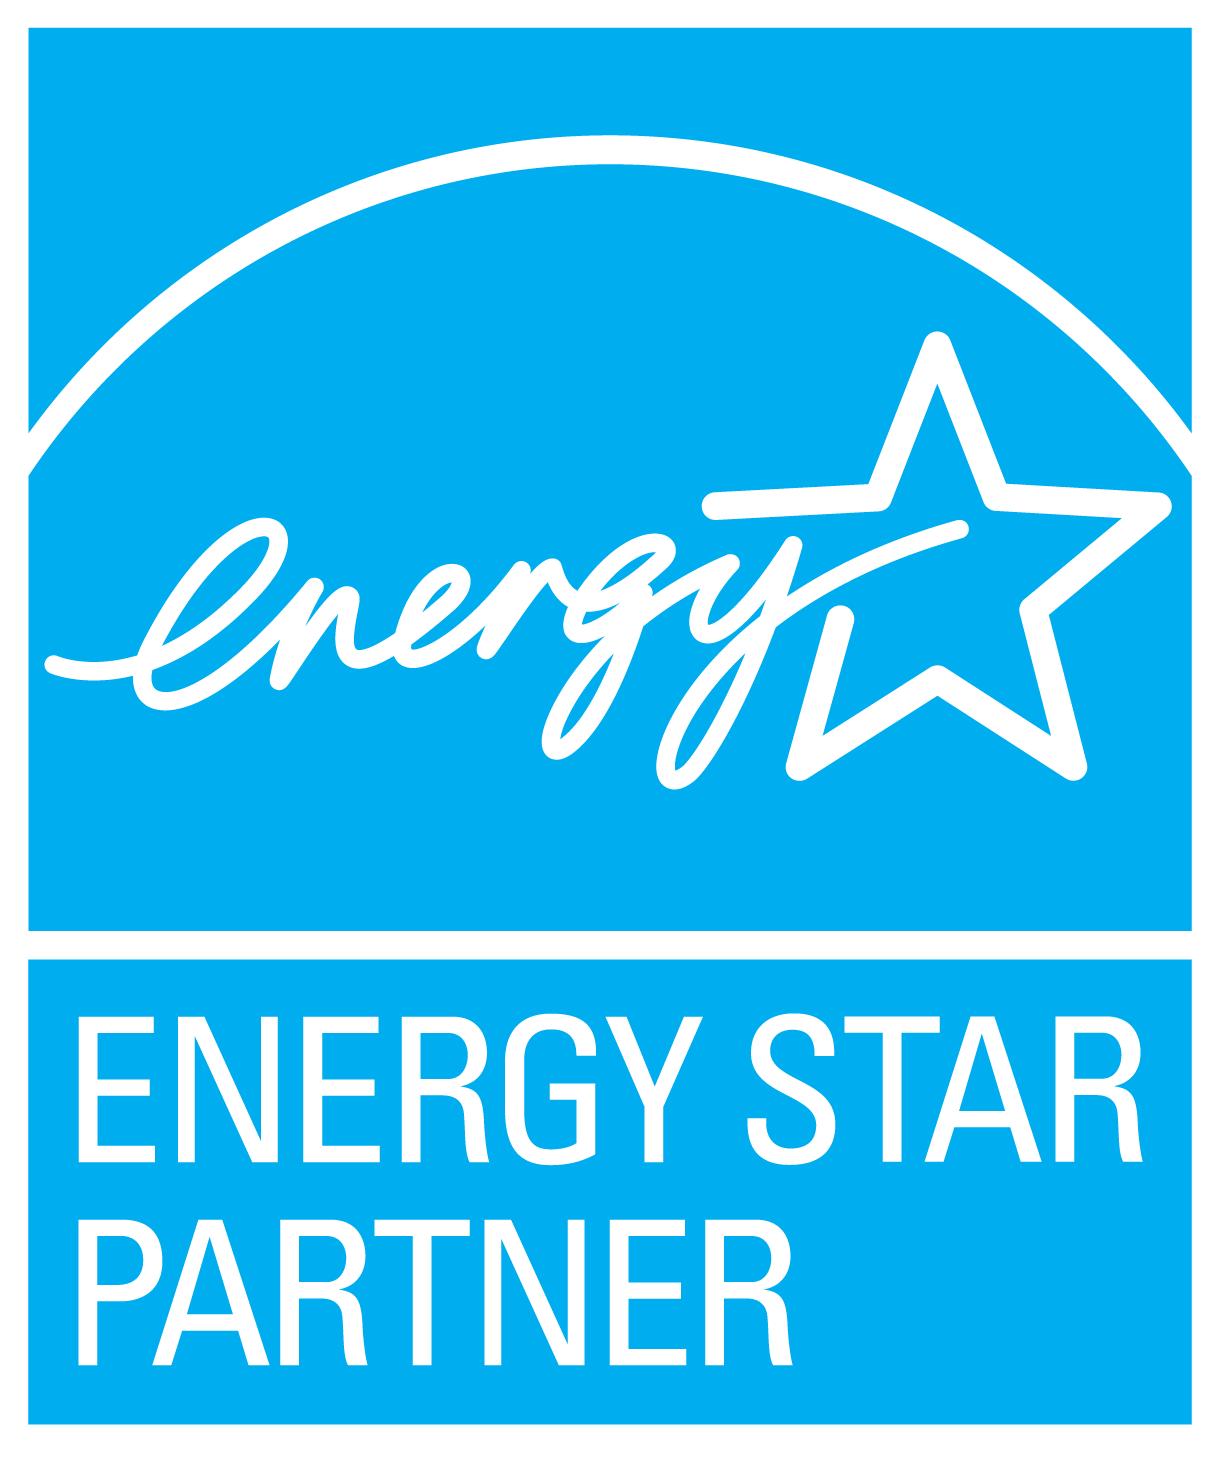 EnergyStarPartner.Blue